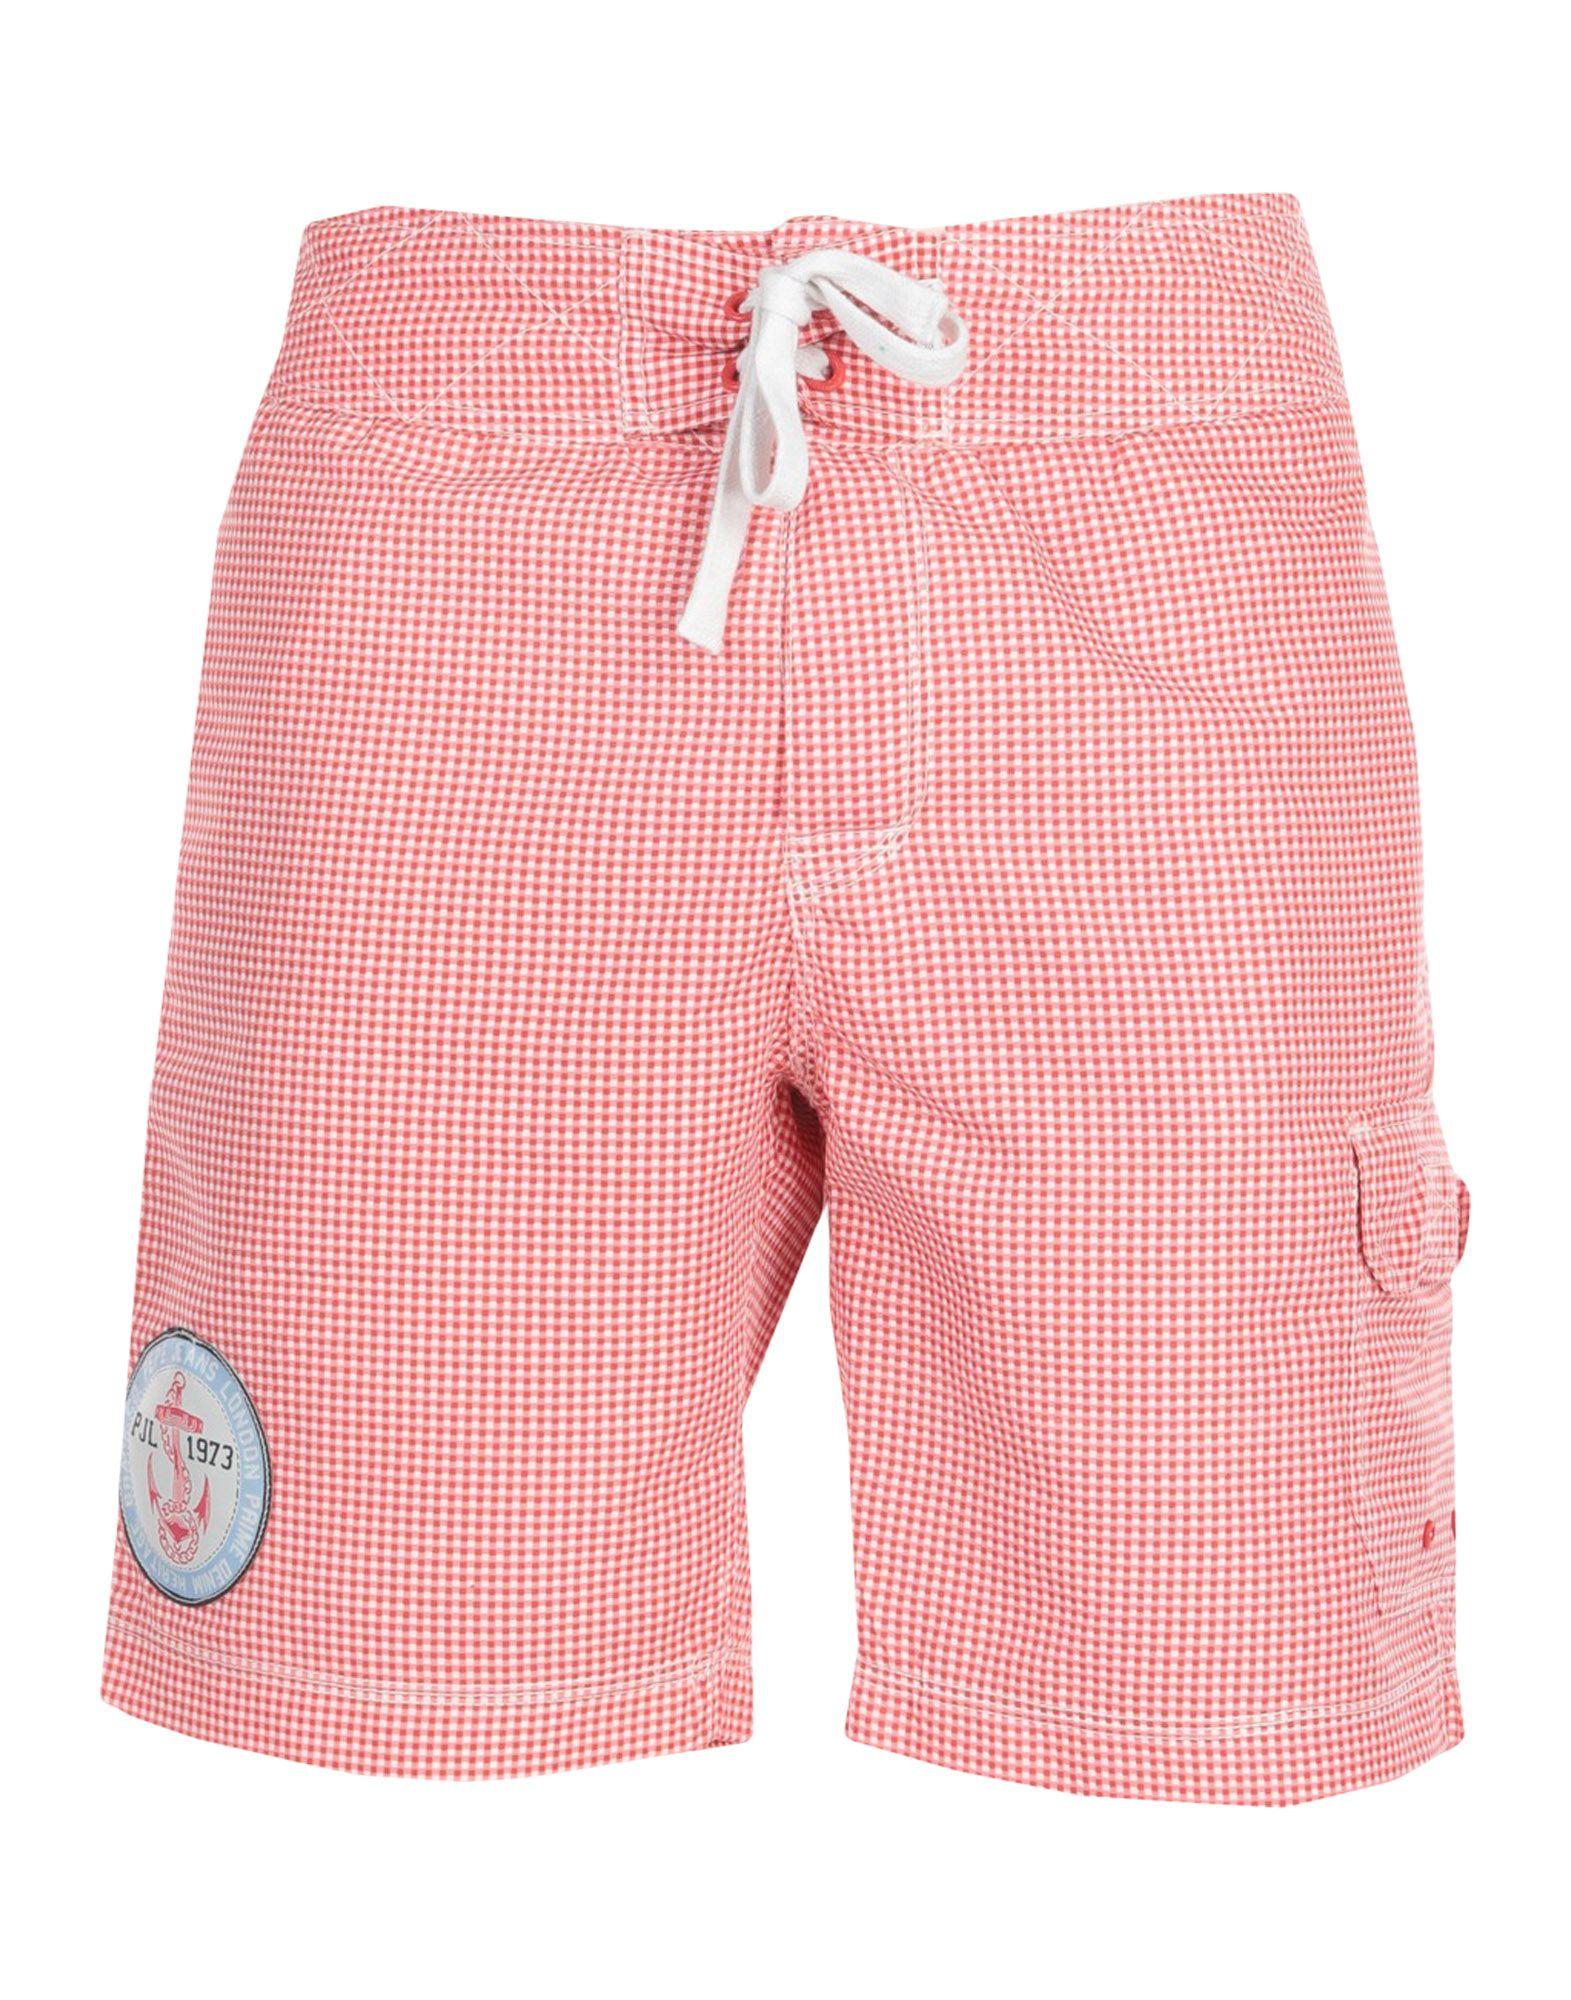 PEPE JEANS 73 Шорты для плавания pepe jeans 73 джинсовые шорты